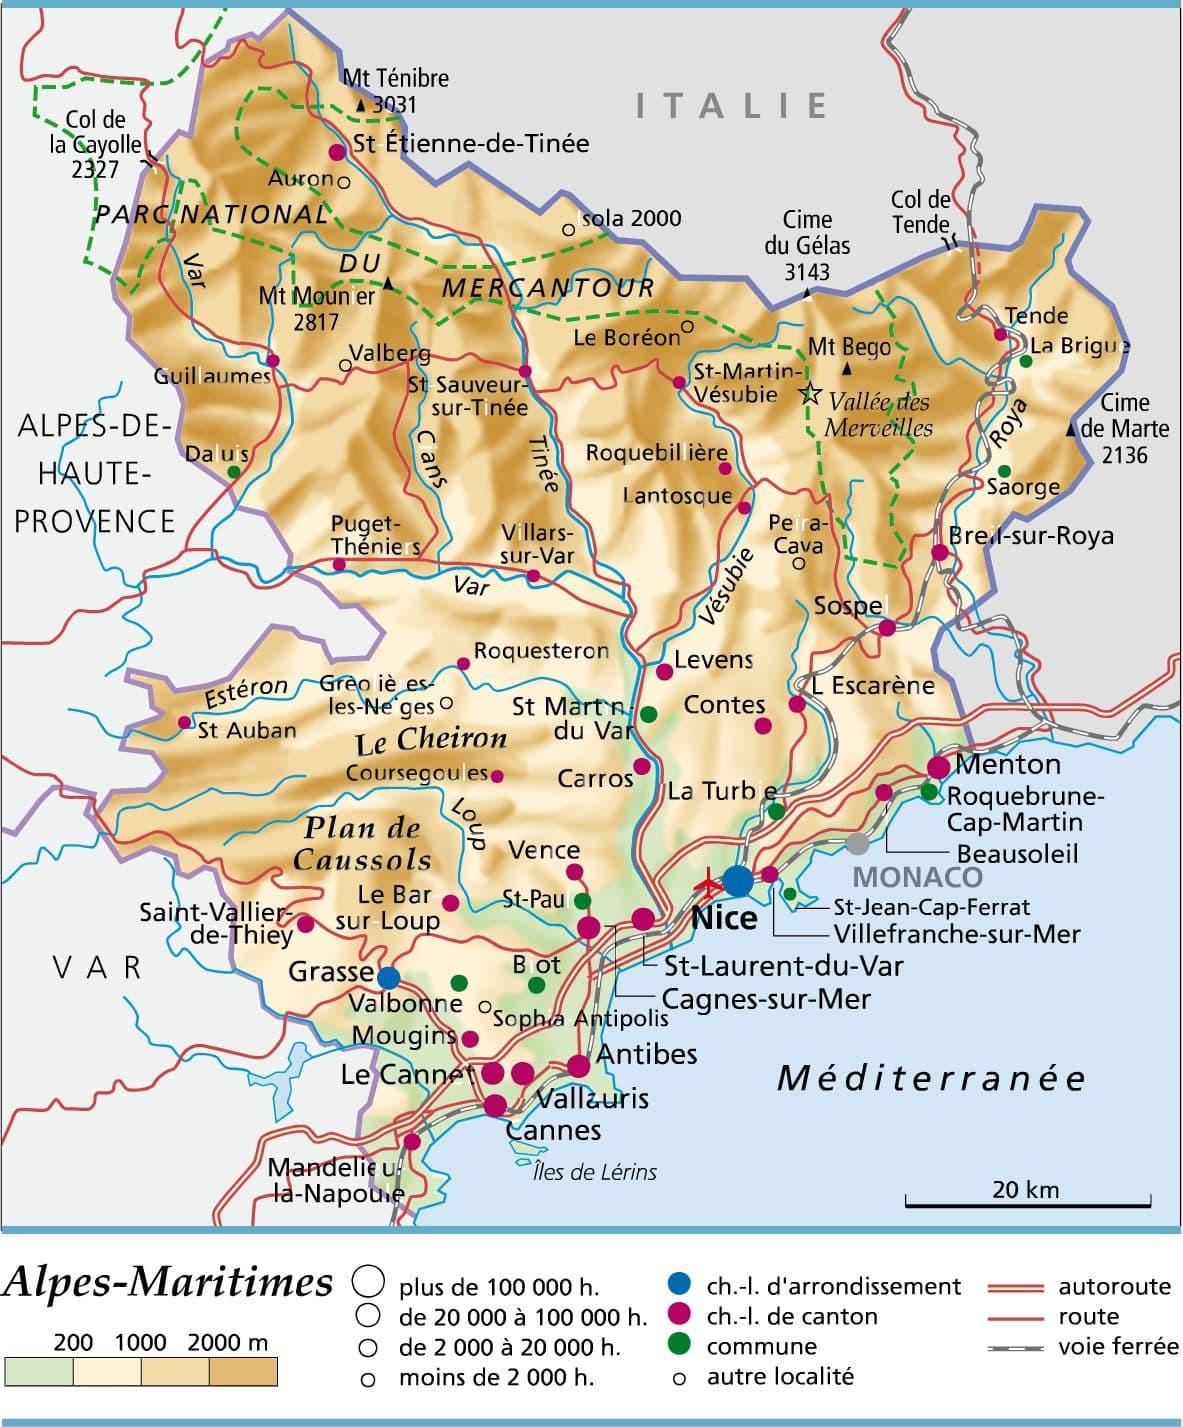 alpes-maritimes - Photo